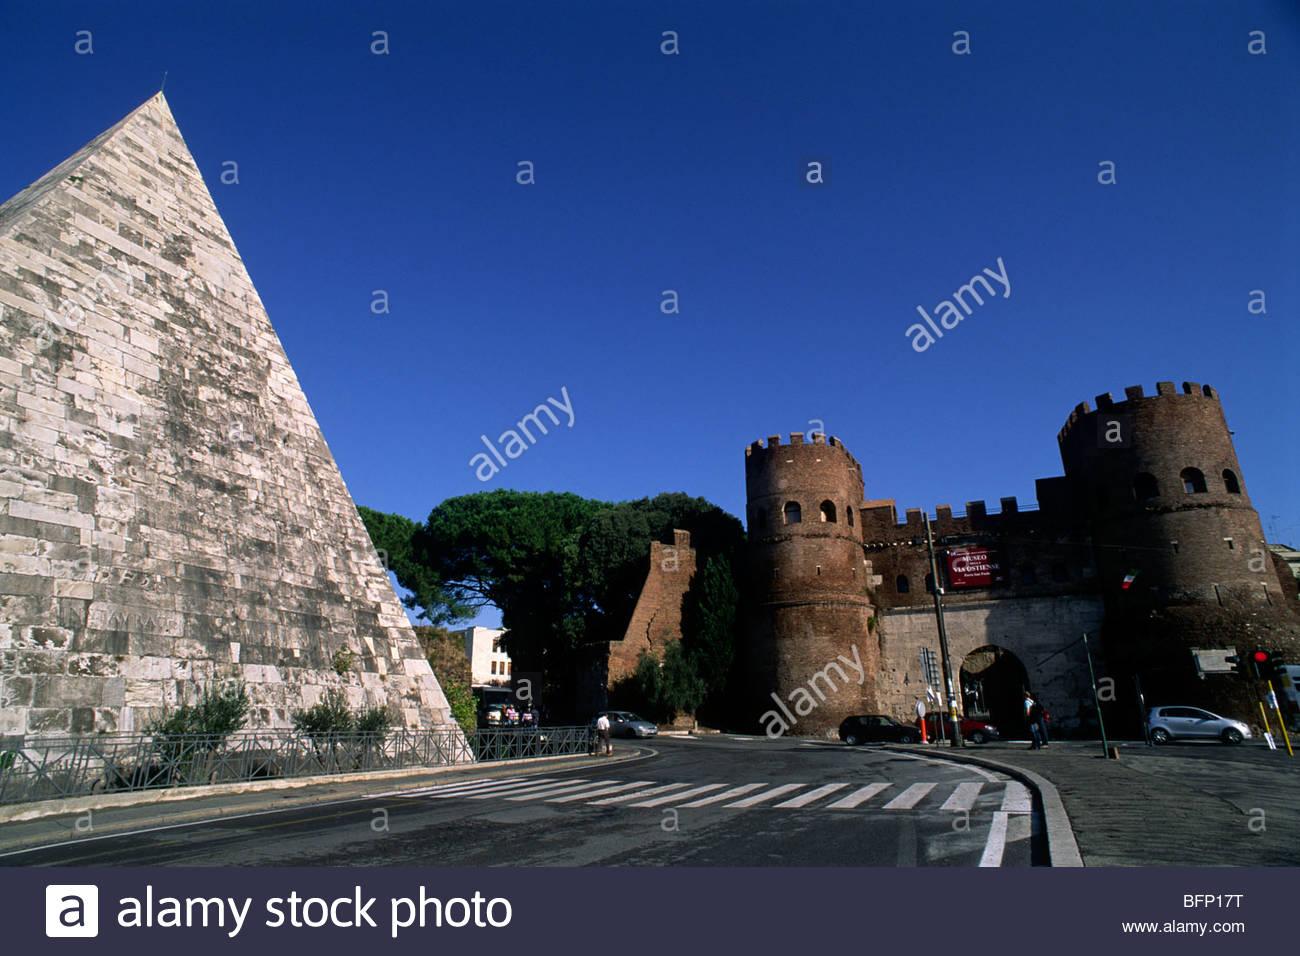 italy, rome, pyramid of caio cestio and porta san paolo Stock Photo